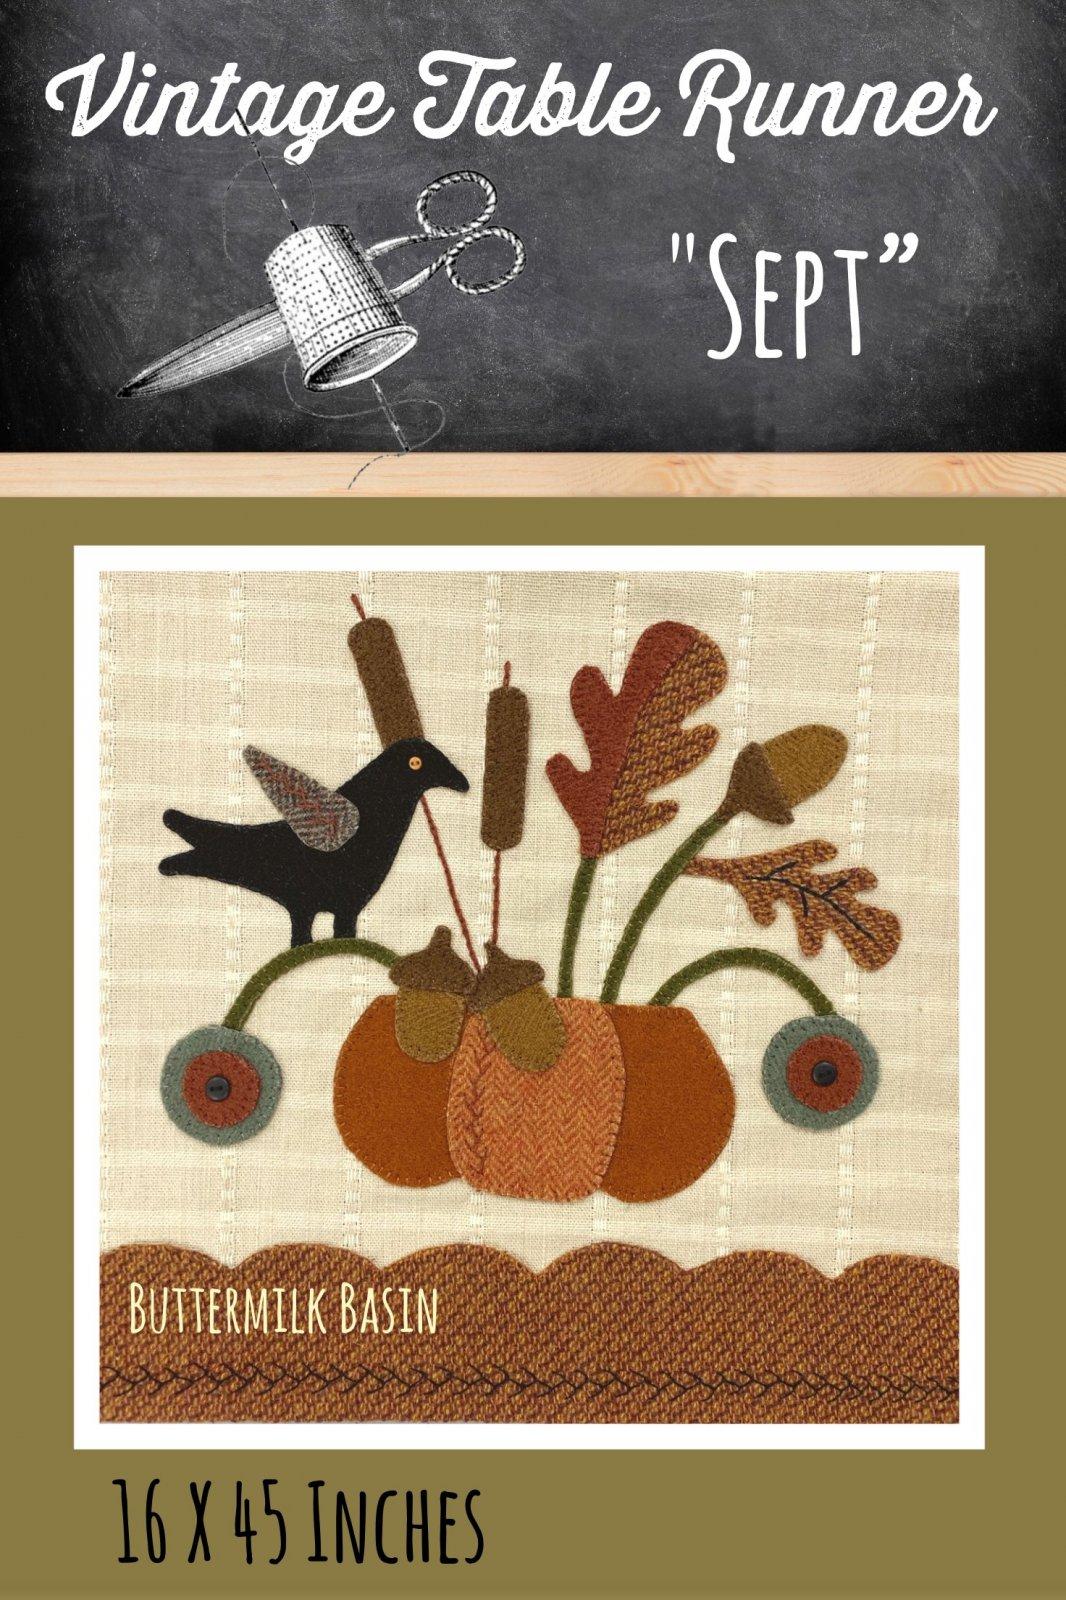 Vintage Table Runner thru the Year September KIT {Both Sides} & Pattern